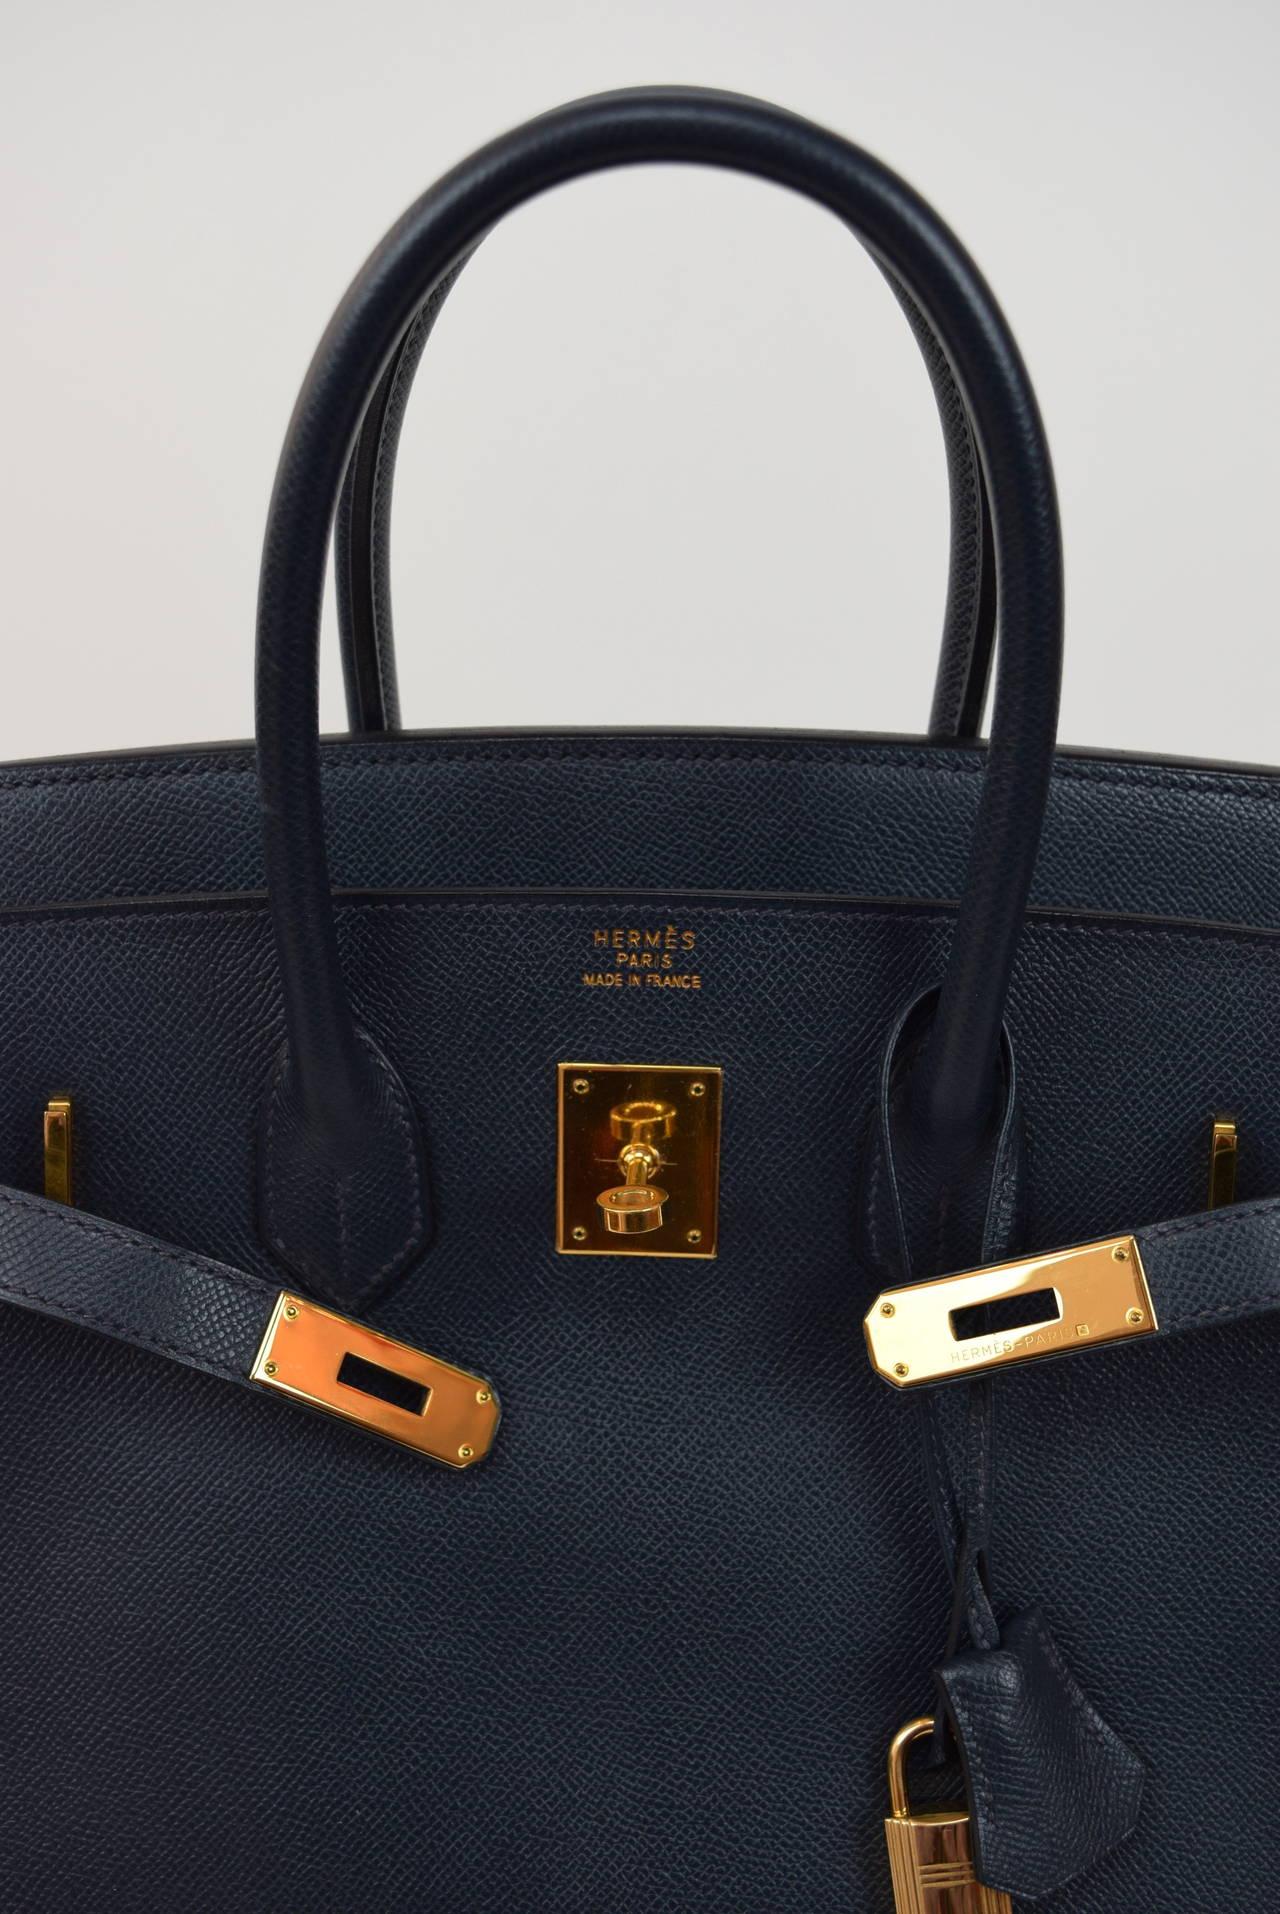 Hermes Dark Navy Blue Coucheval Birkin 35 cm bag at 1stdibs